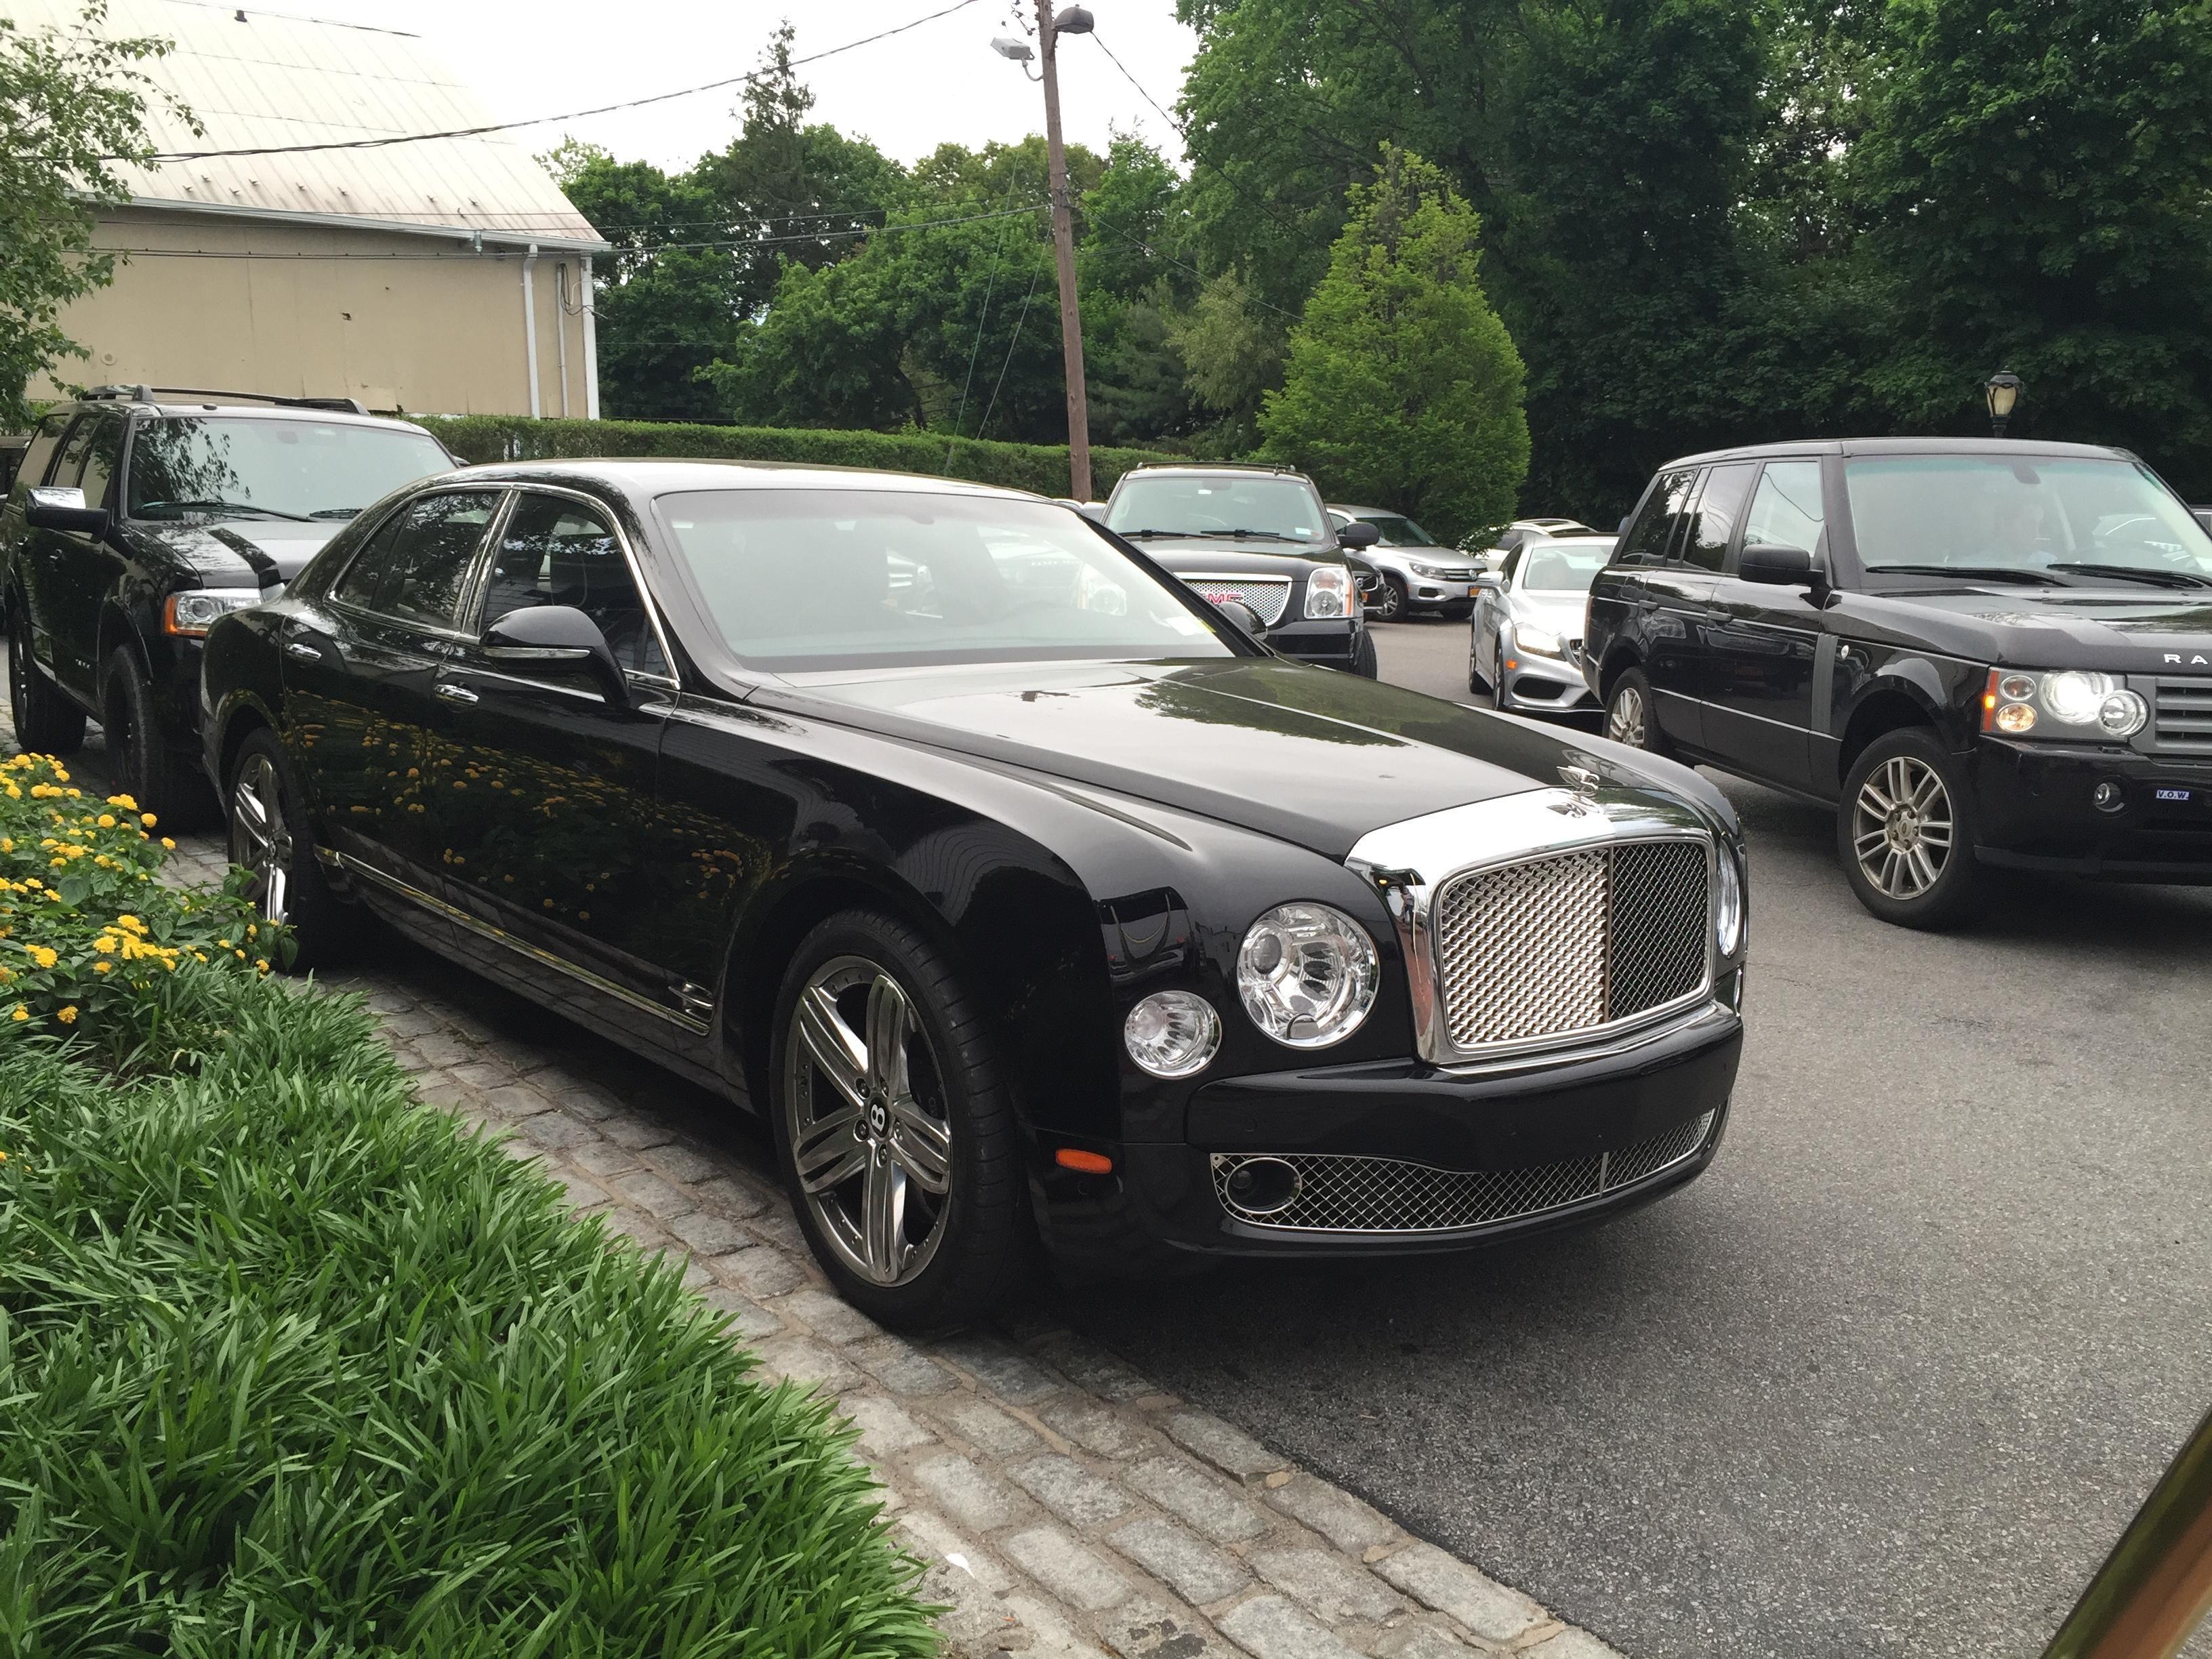 Bentley Mulsanne Roslyn NY #carspotting #cars #car #carporn #supercar #carspotter #supercars